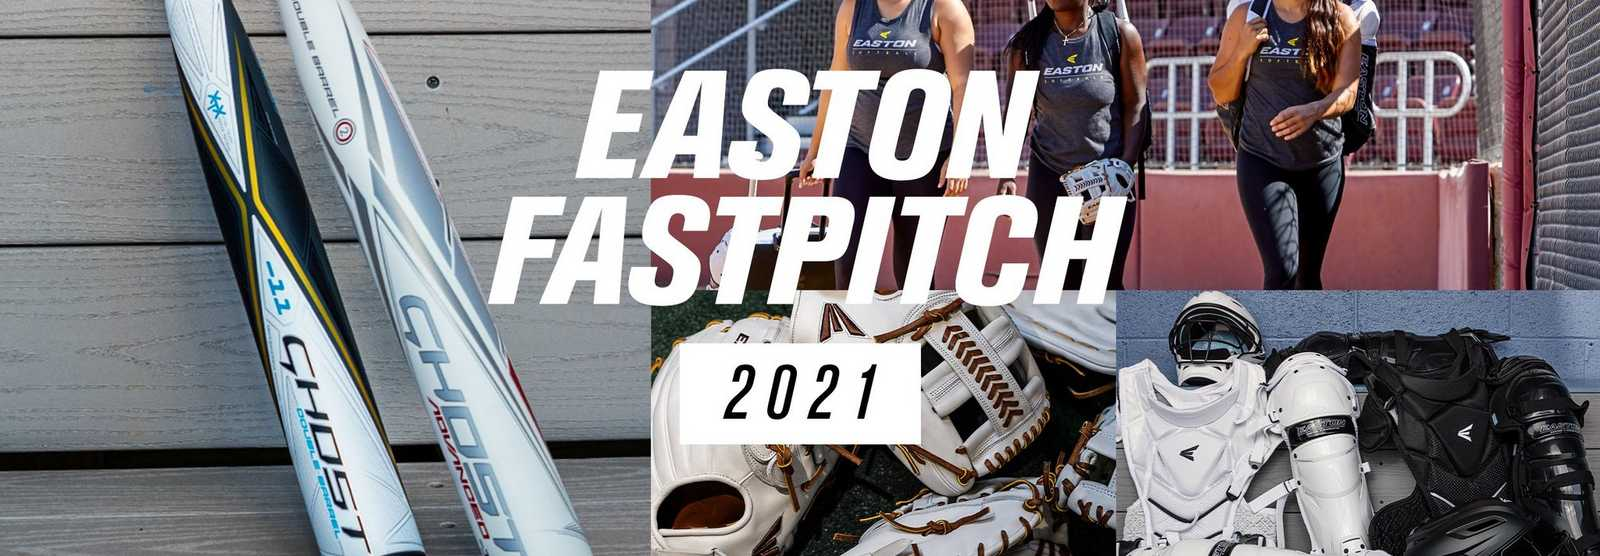 easton-2021-fastpitch